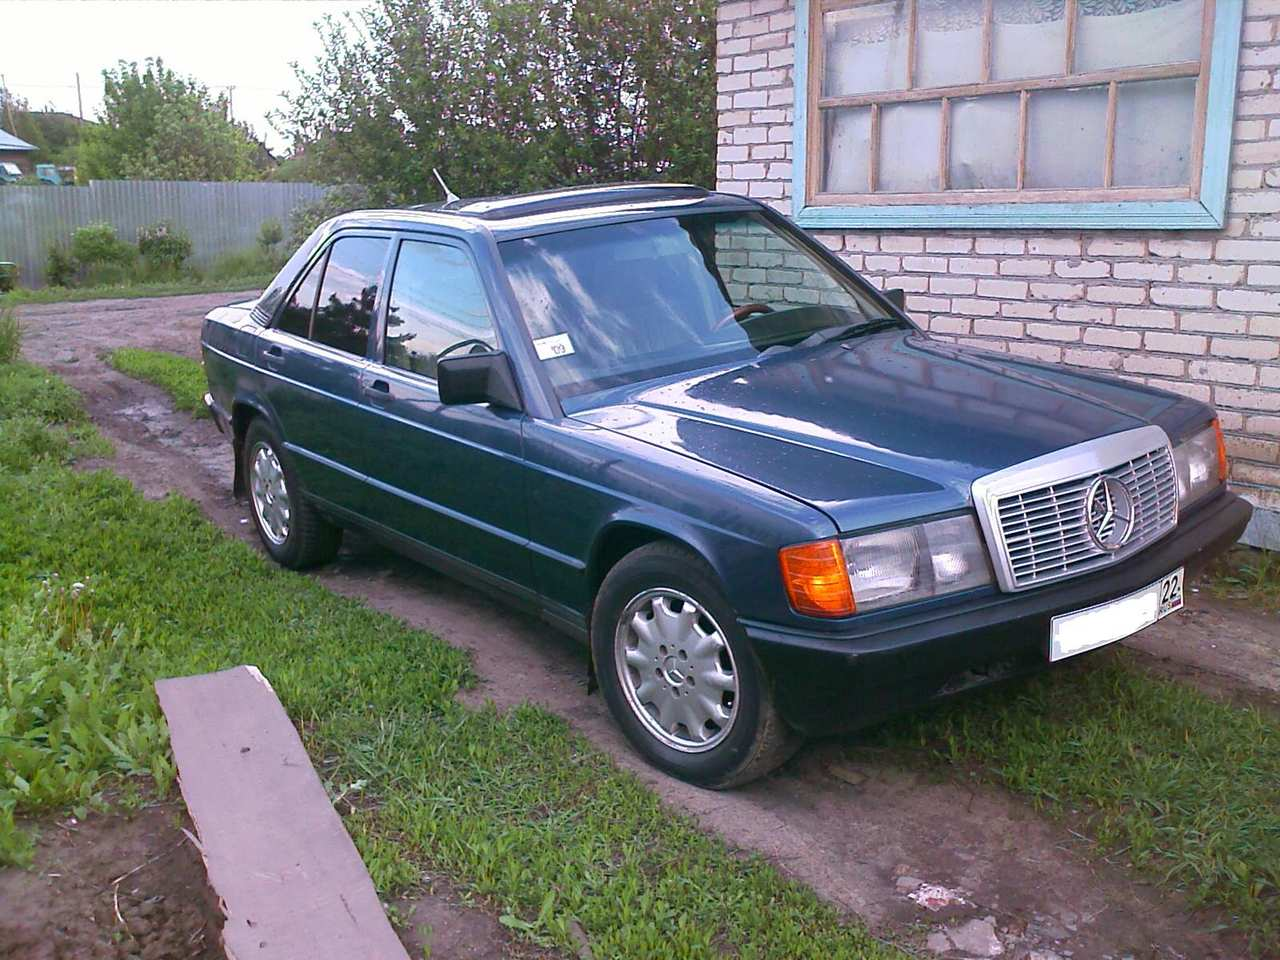 1986 mercedes benz 190 for sale 2000cc gasoline fr or for 190 mercedes benz for sale